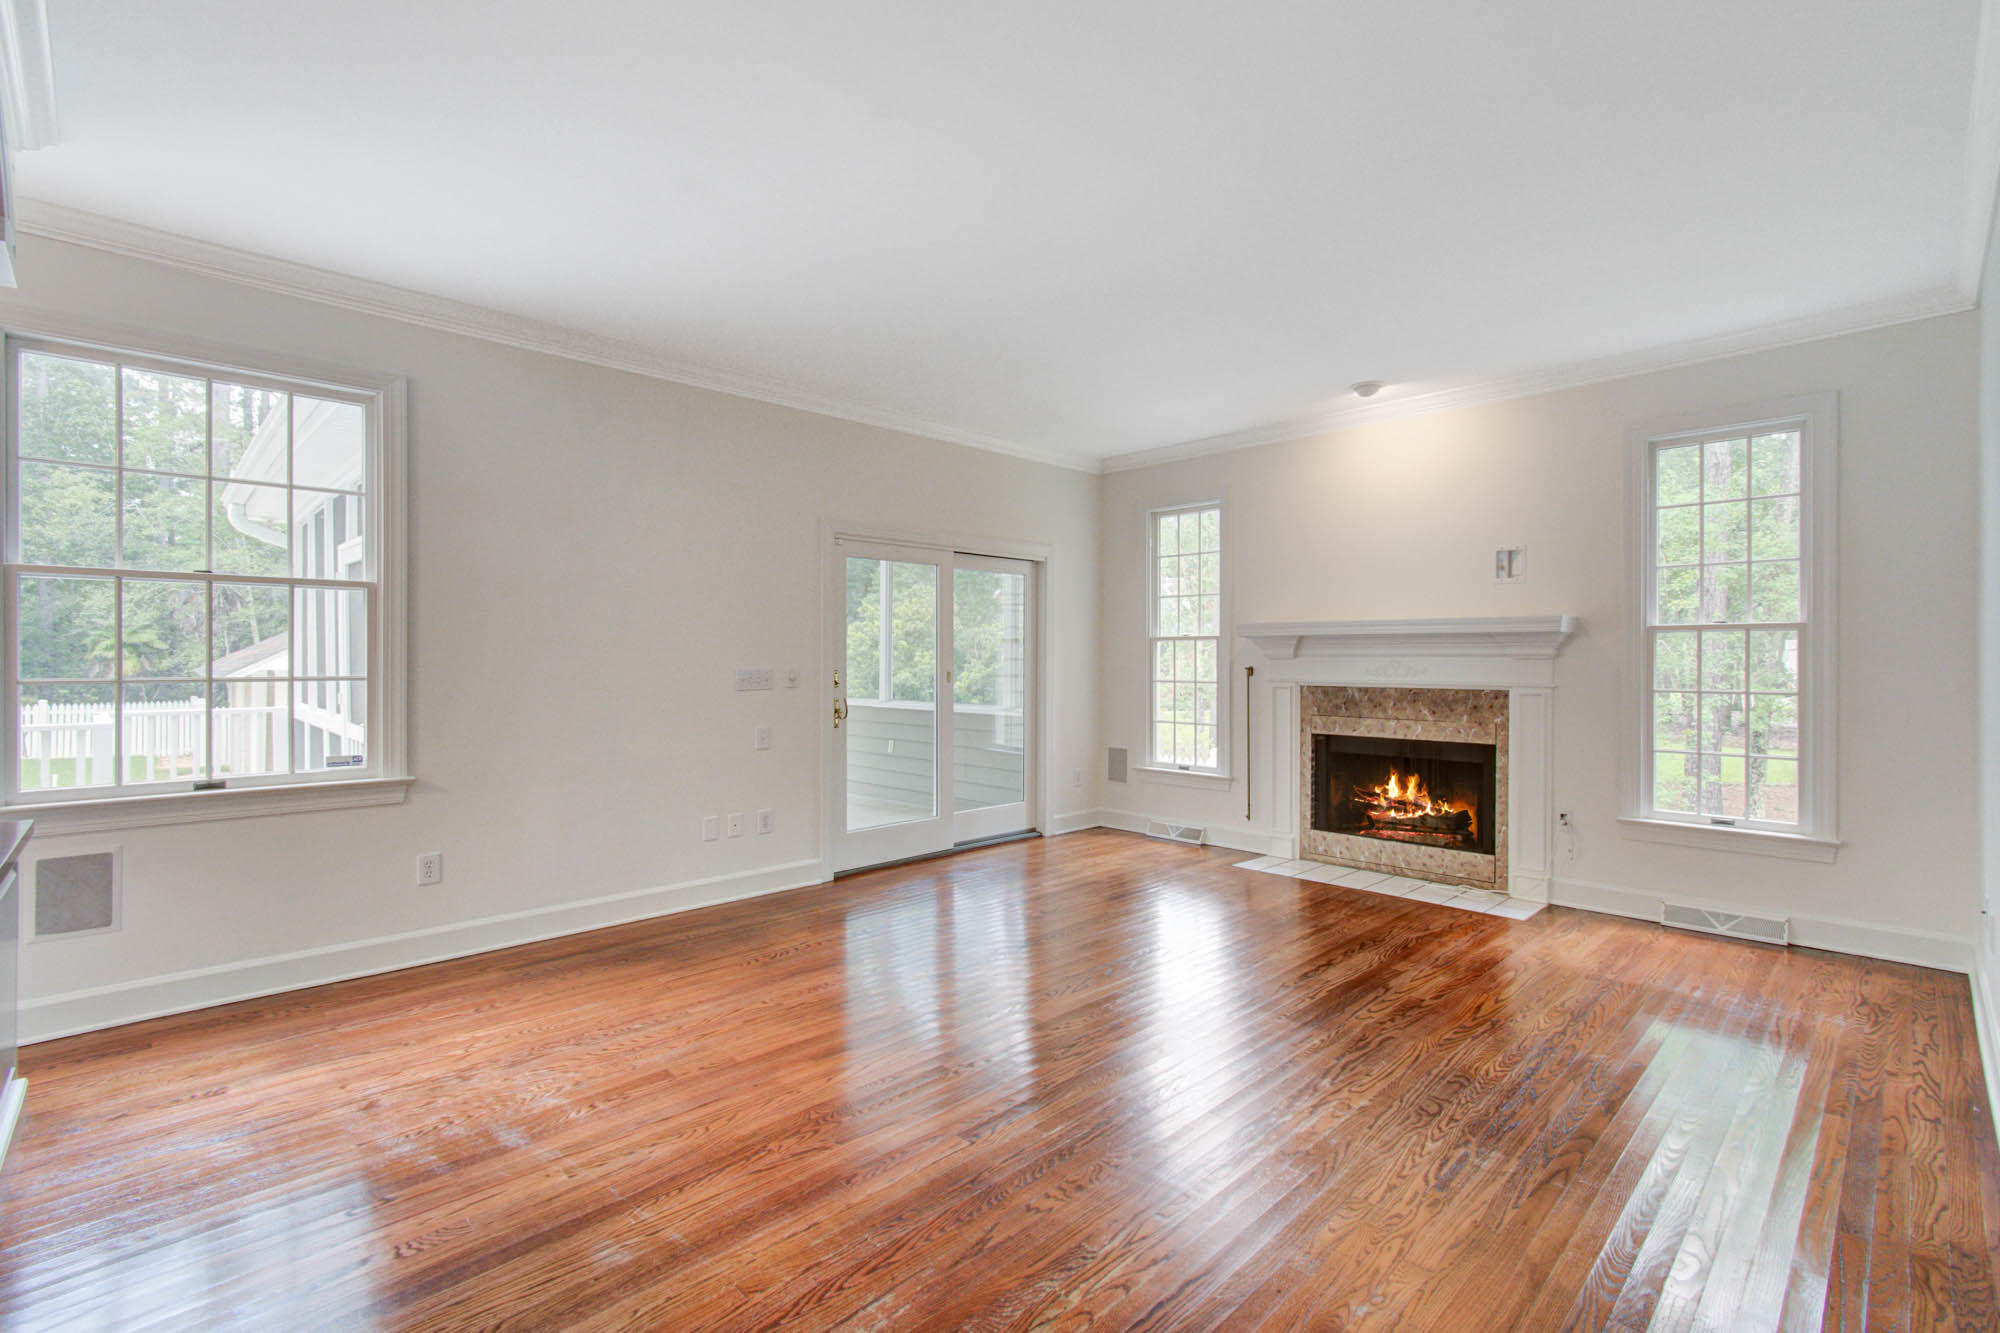 Dunes West Homes For Sale - 3515 Colonel Vanderhorst, Mount Pleasant, SC - 49